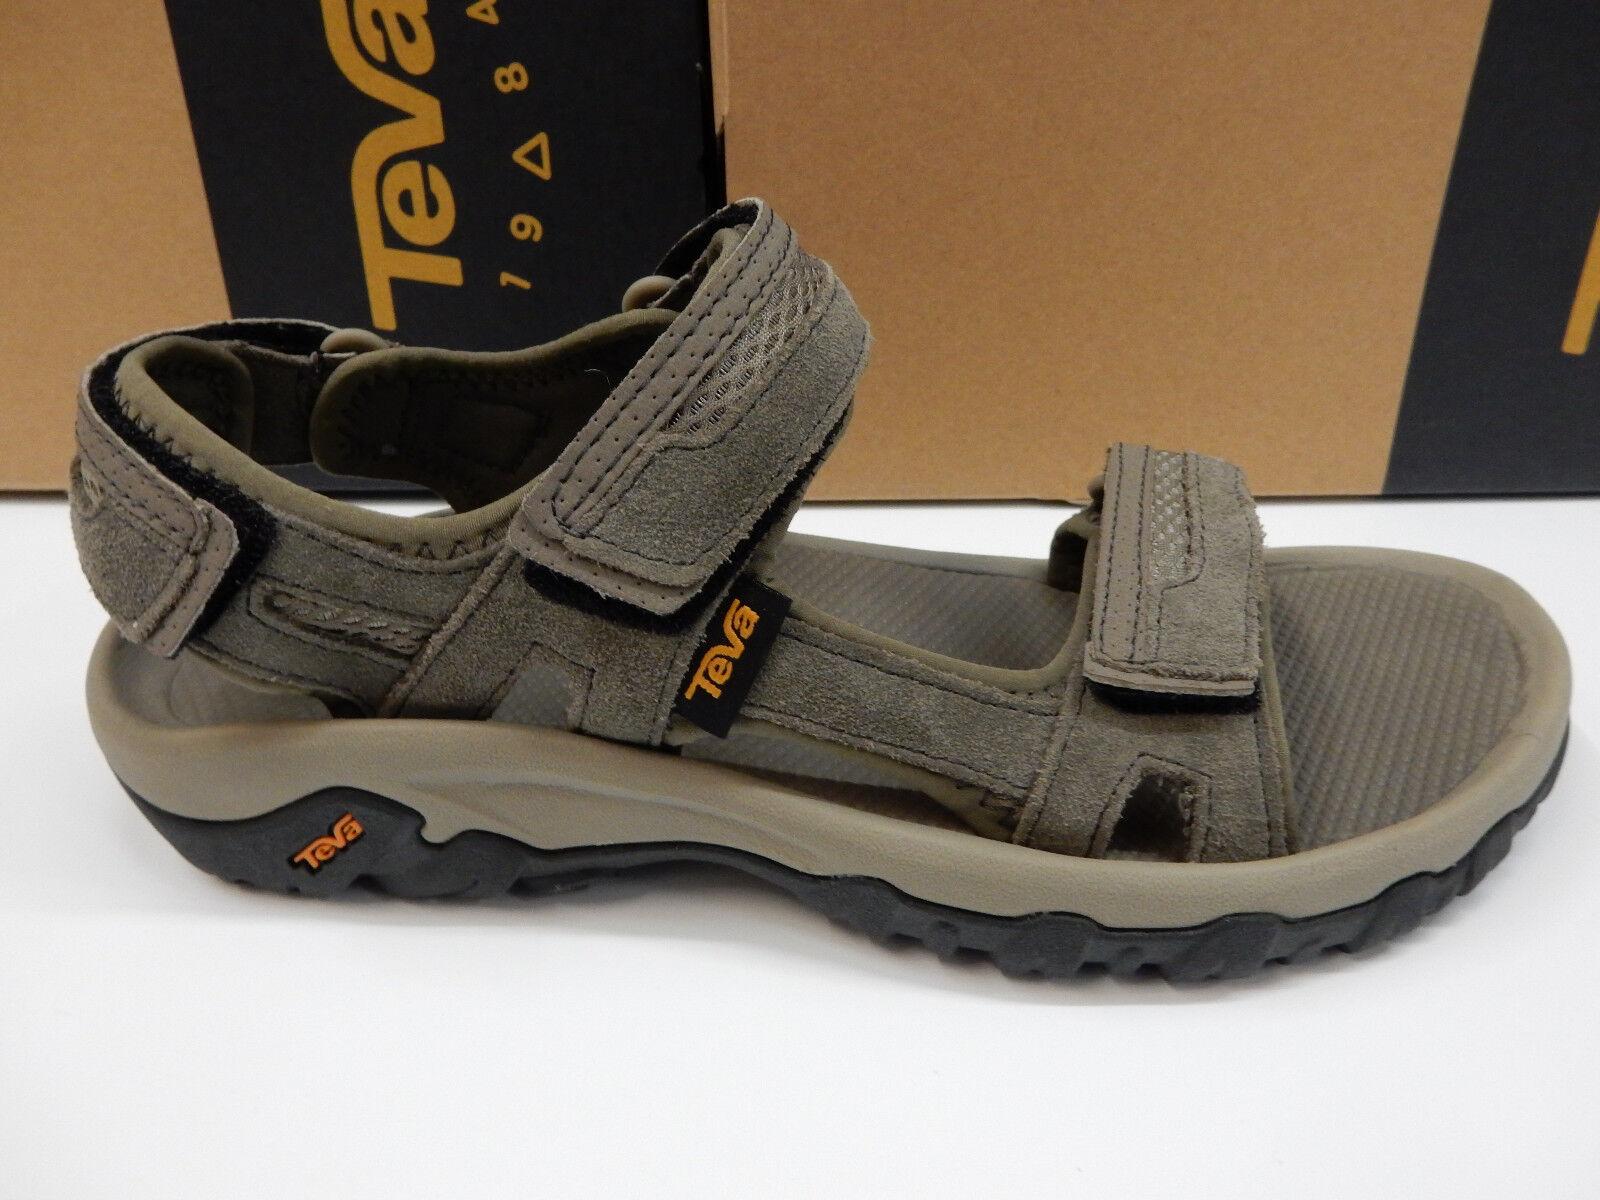 Teva Mens Hudson Hudson Hudson Sandal Bungee Cord Size 12 7d6788